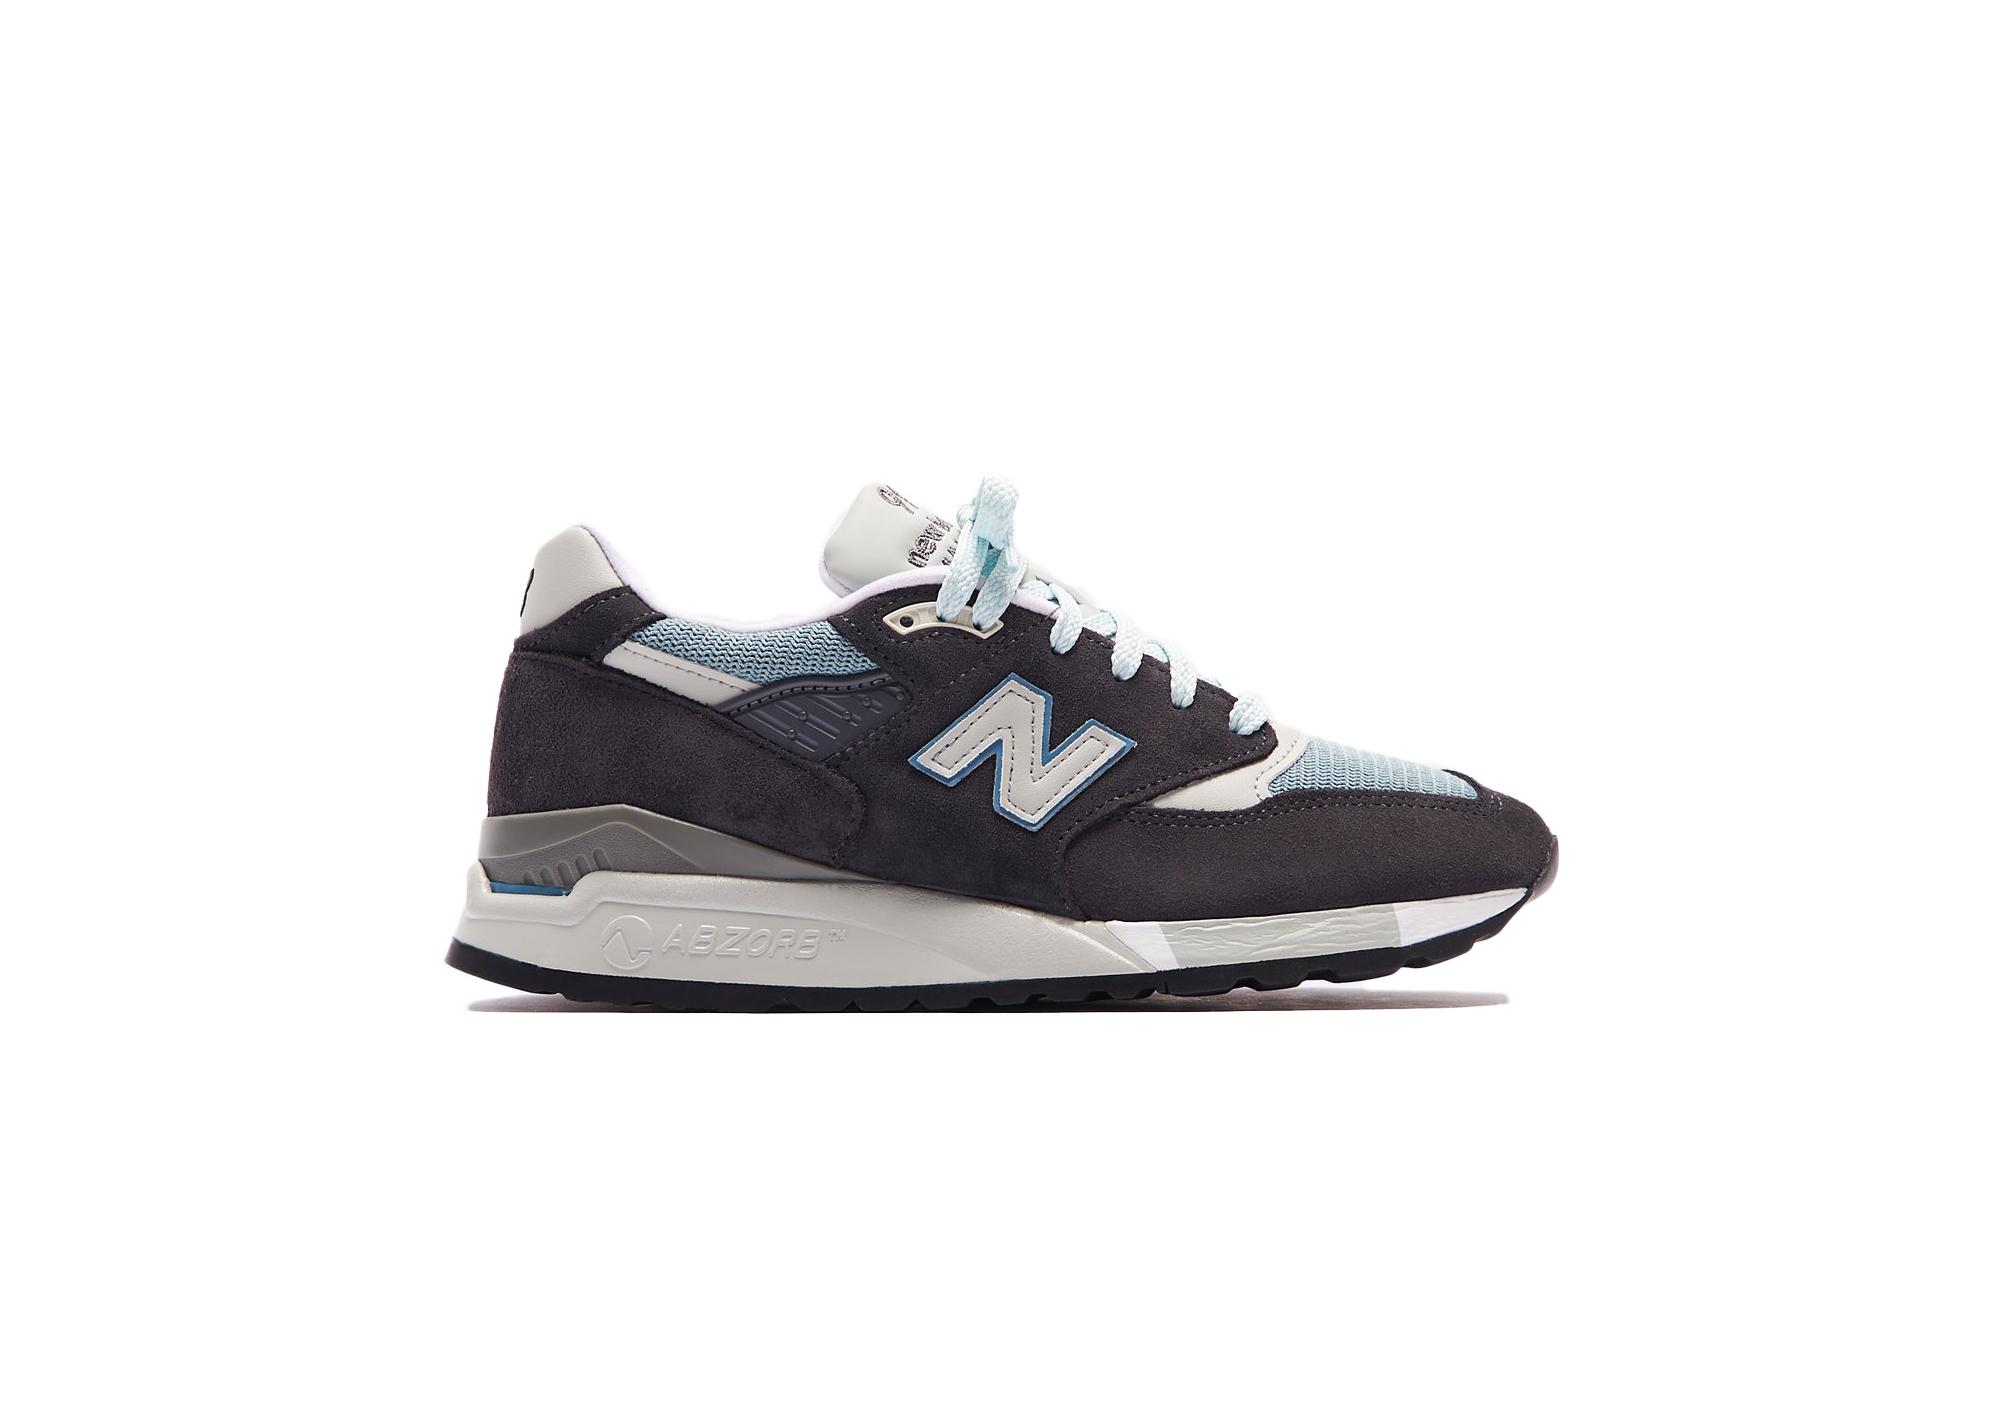 New Balance 998 Kith Spring 2